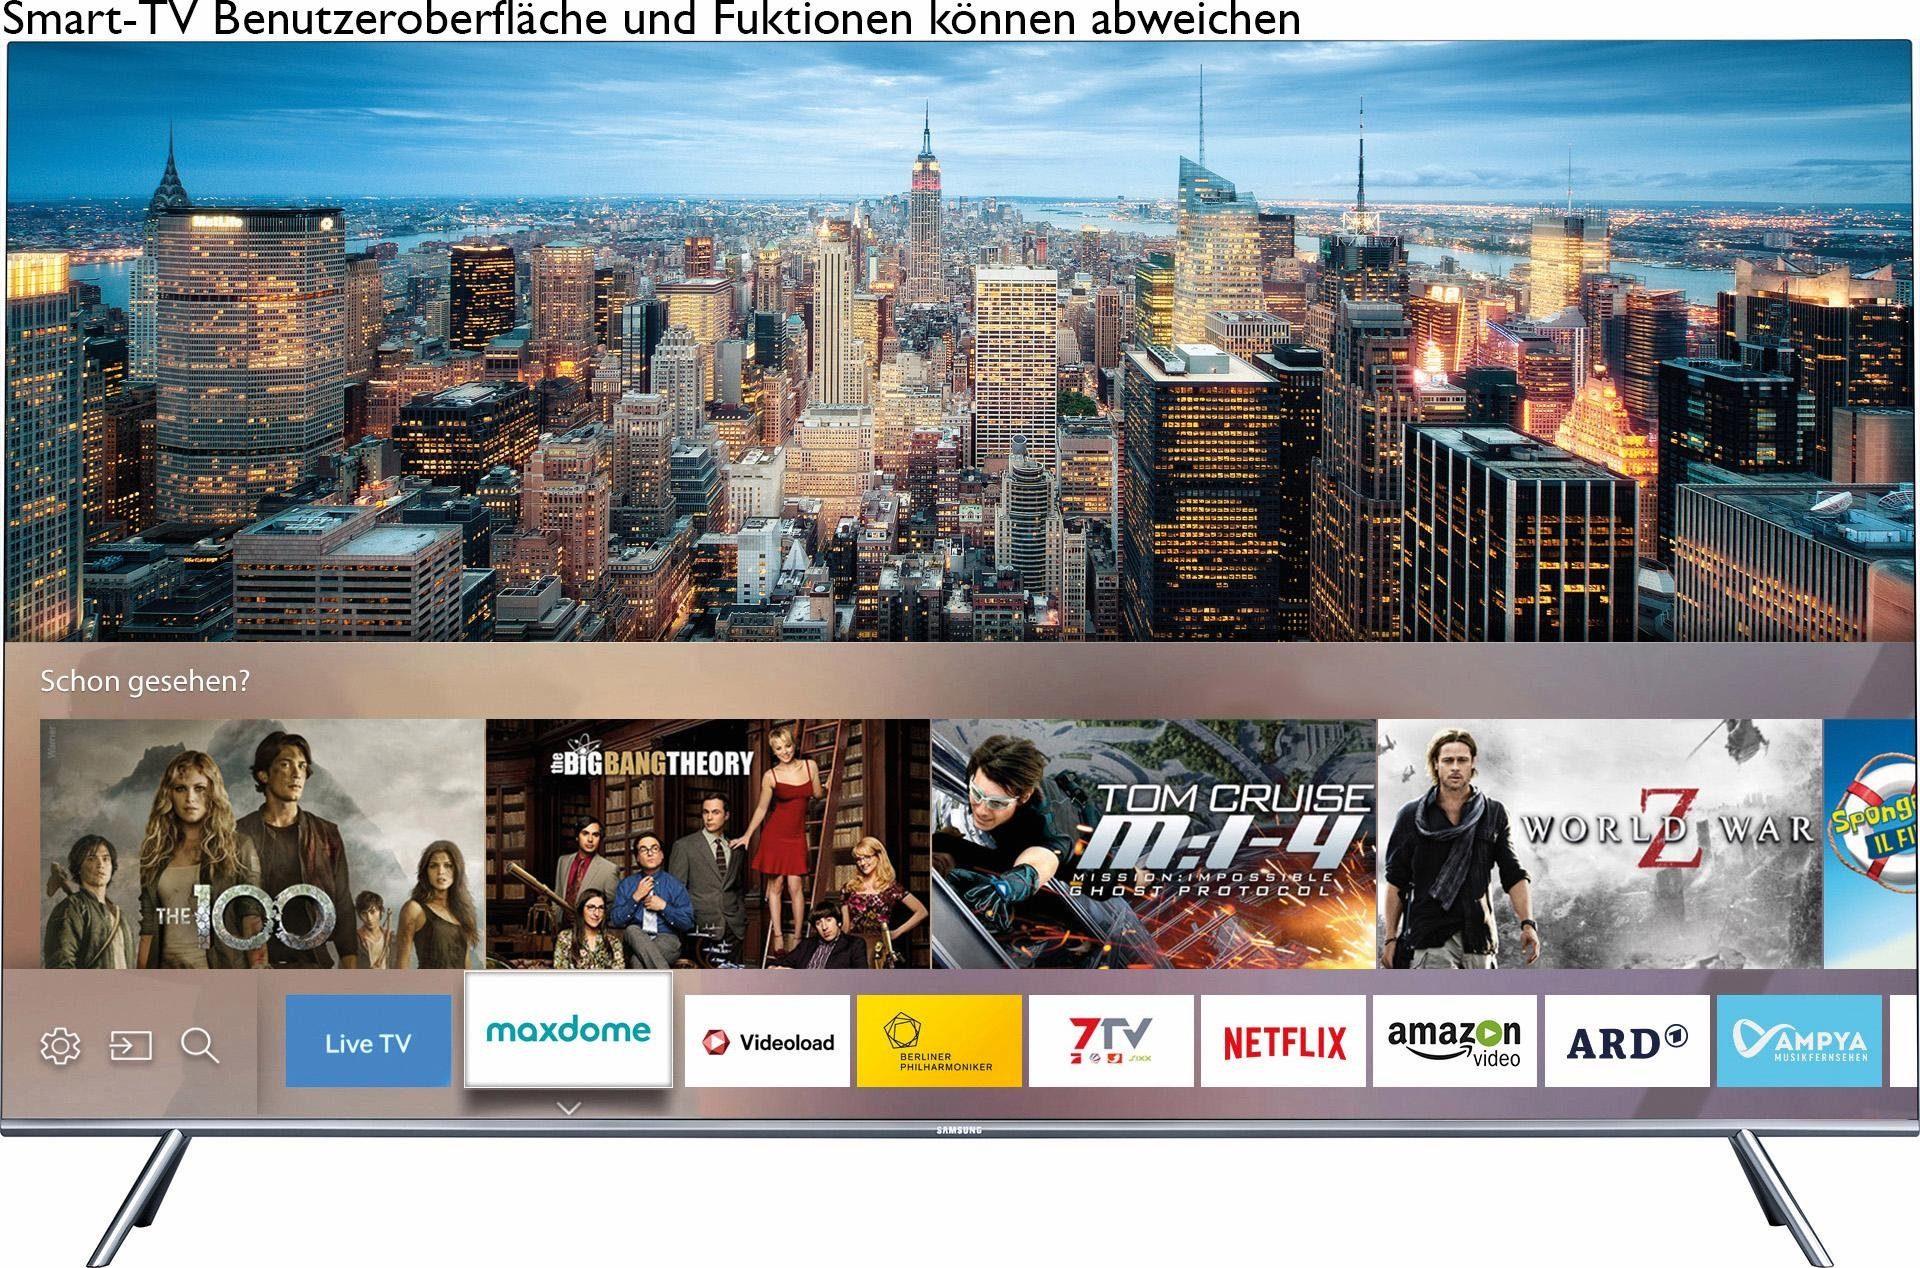 Samsung UE55KS7590UXZG, Curved-LED-Fernseher, 138 cm (55 Zoll), 2160p (SUHD), Smart-TV